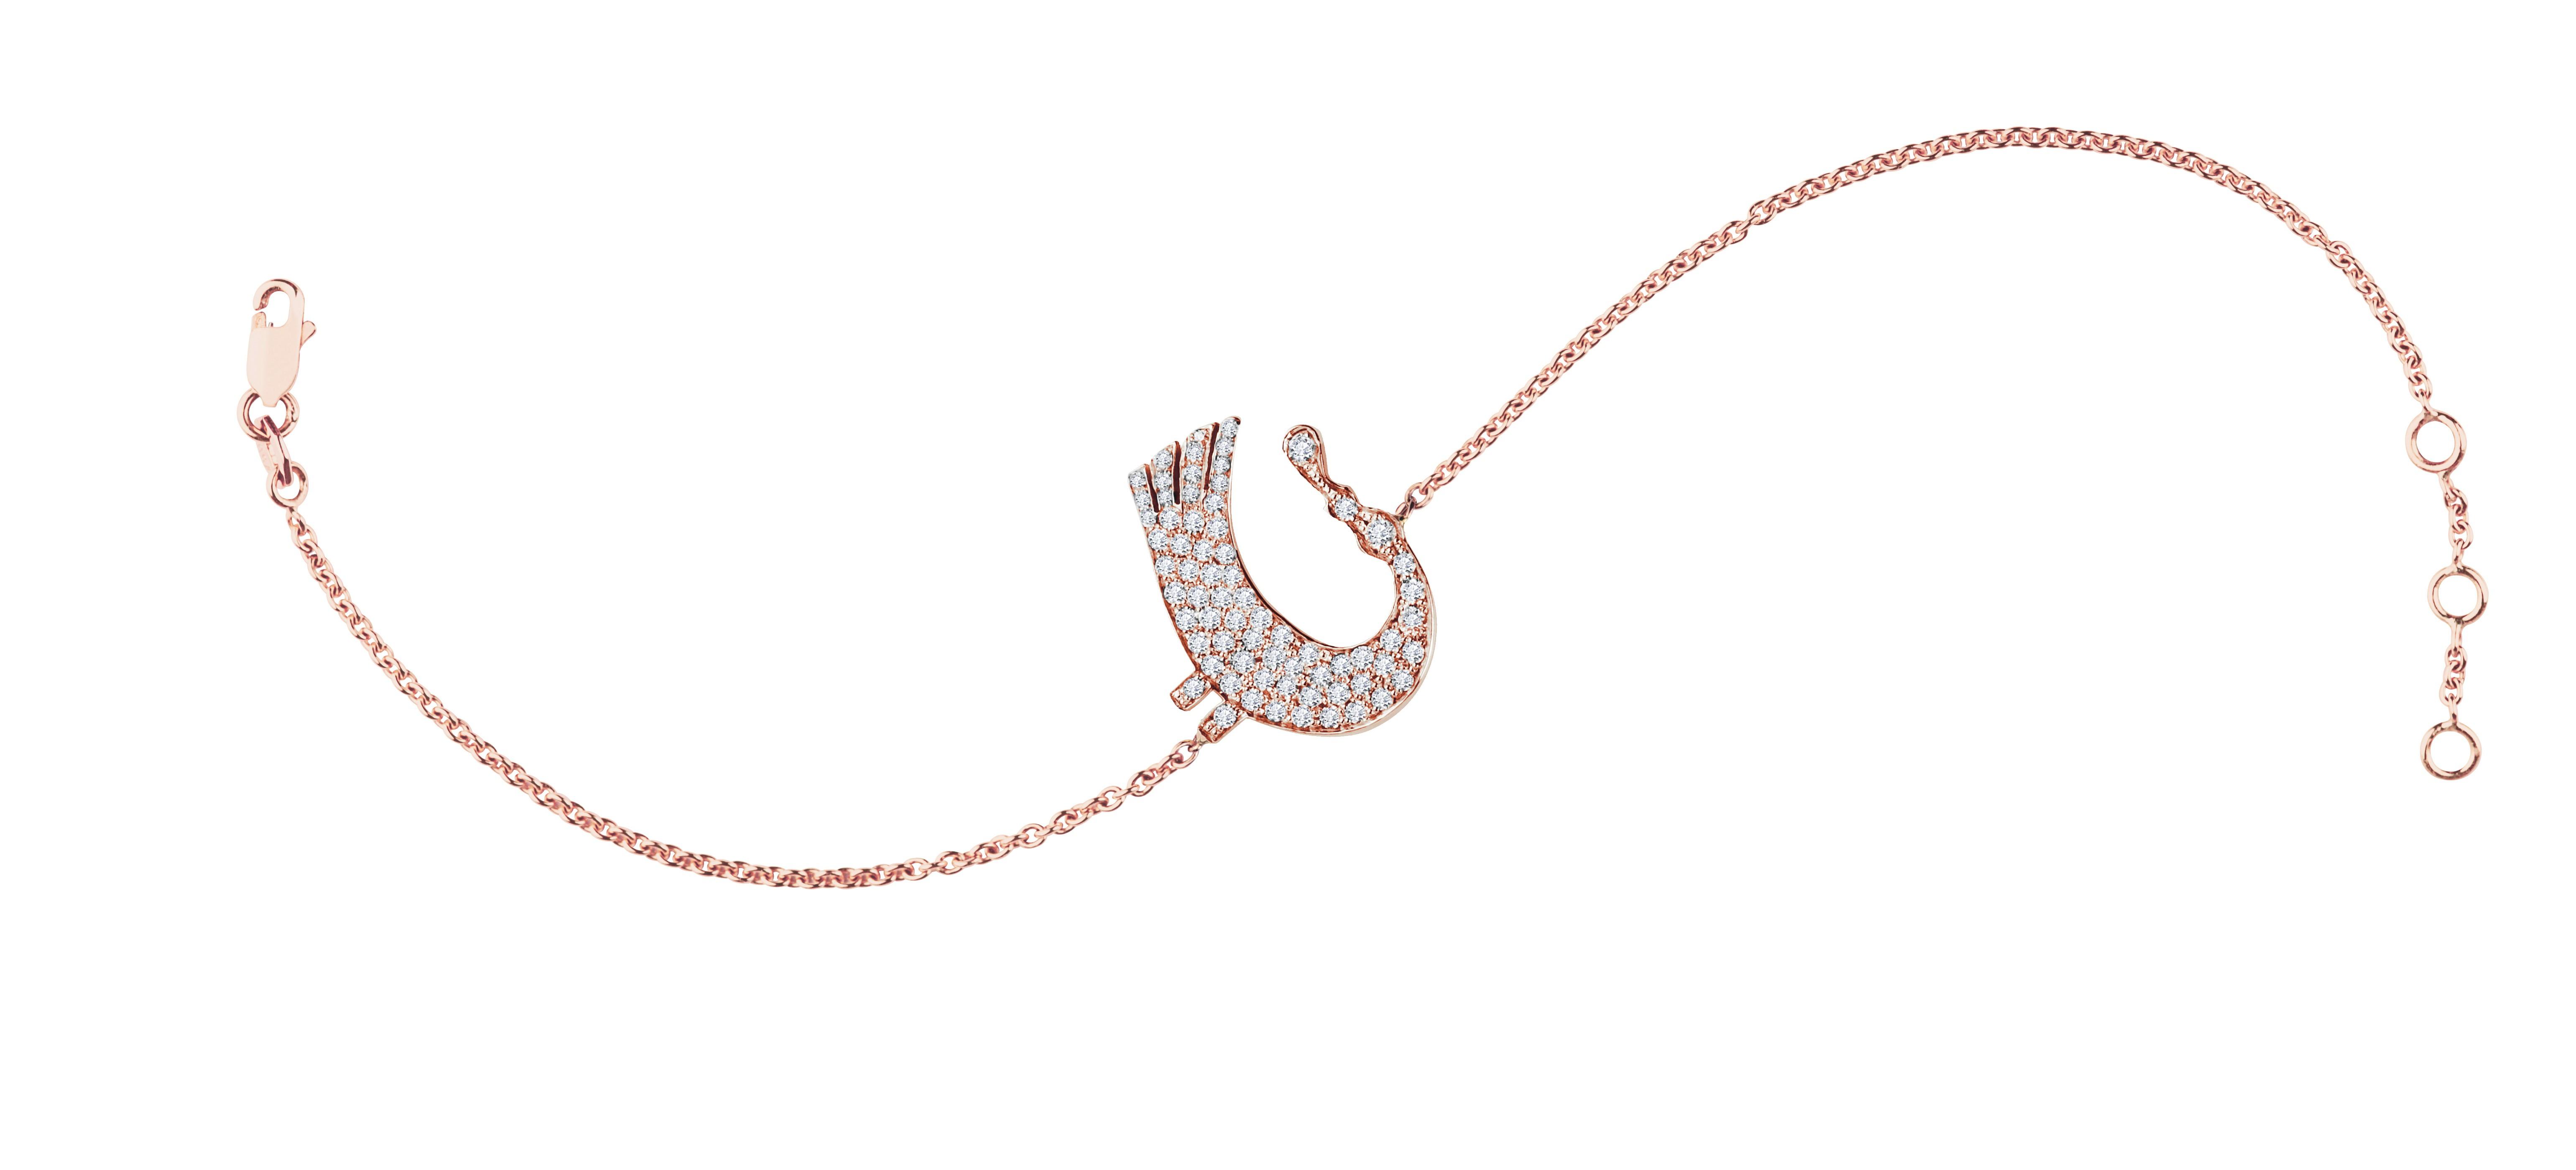 Sagesse Bakwani7 Or diamants – Bracelet